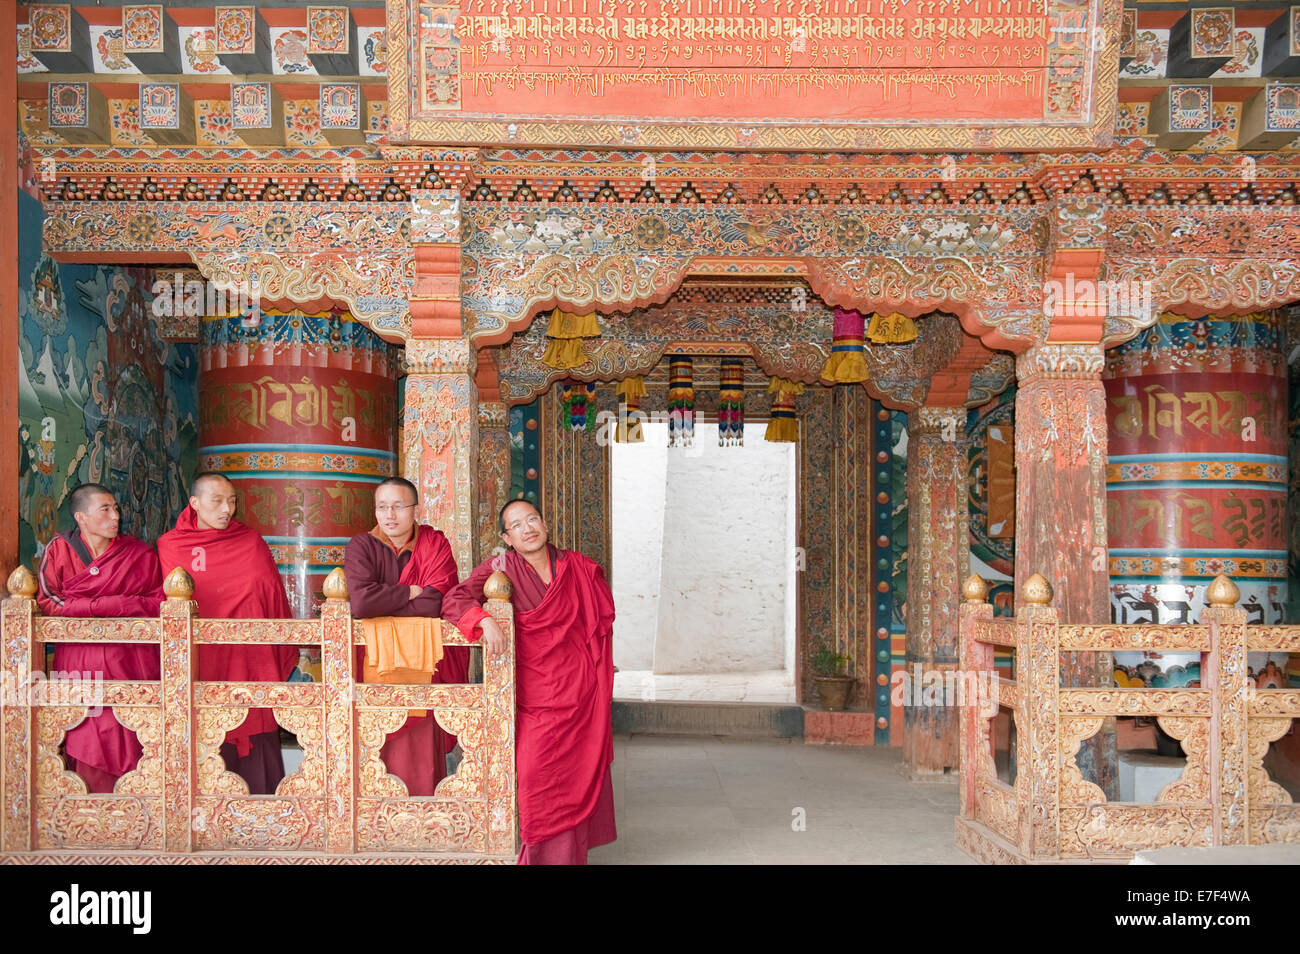 Four monks in red robes, ornate wooden wall, Buddhist Tango Goemba Monastery near Thimphu, Kingdom of Bhutan - Stock Image